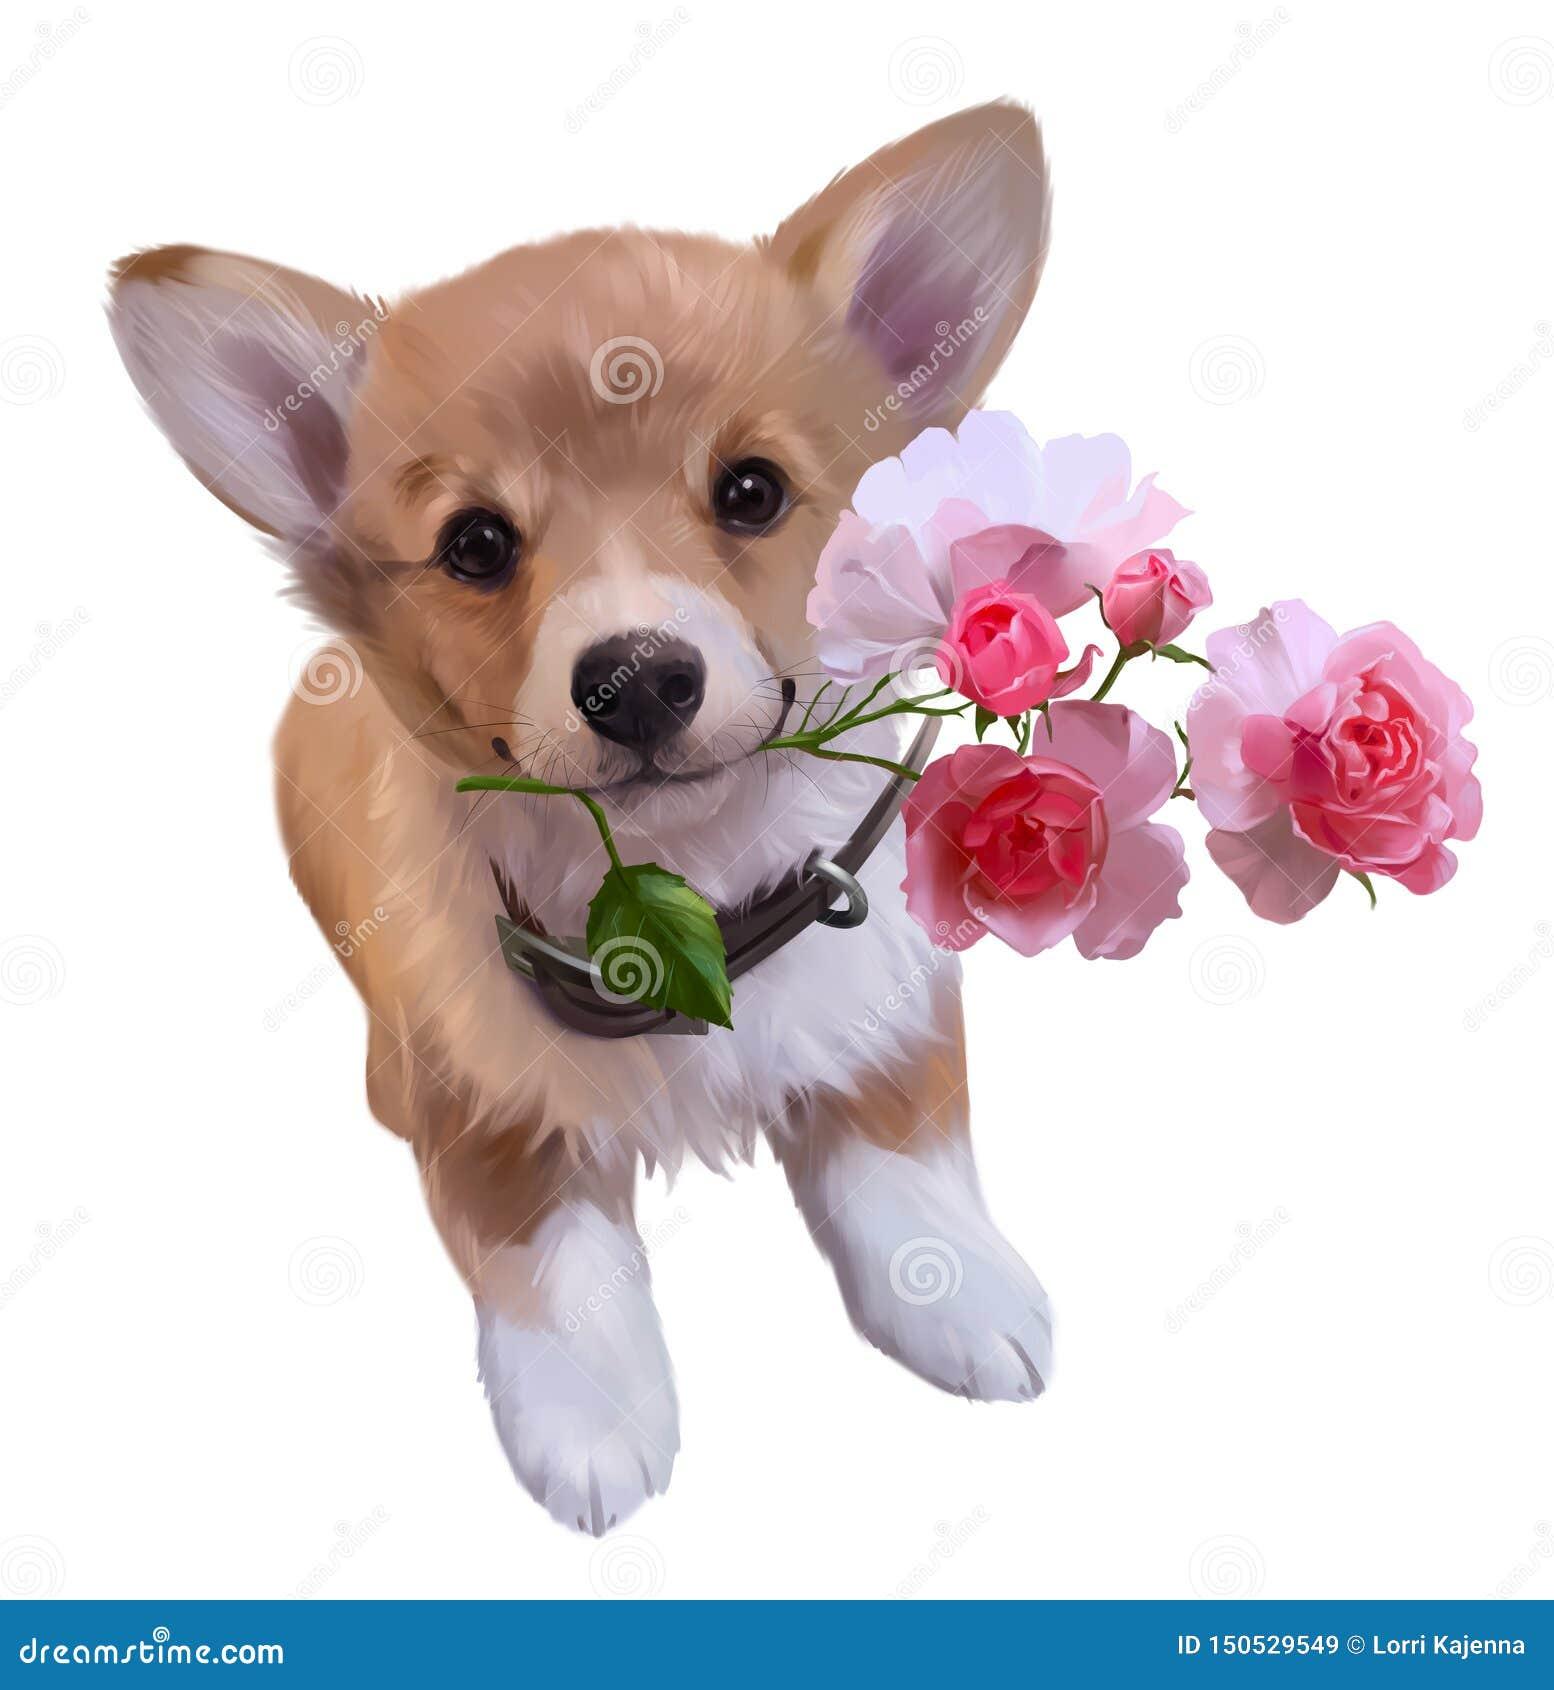 Corgi Puppy And Rose Branch Watercolor Drawing Stock Illustration Illustration Of Cute Mammal 150529549